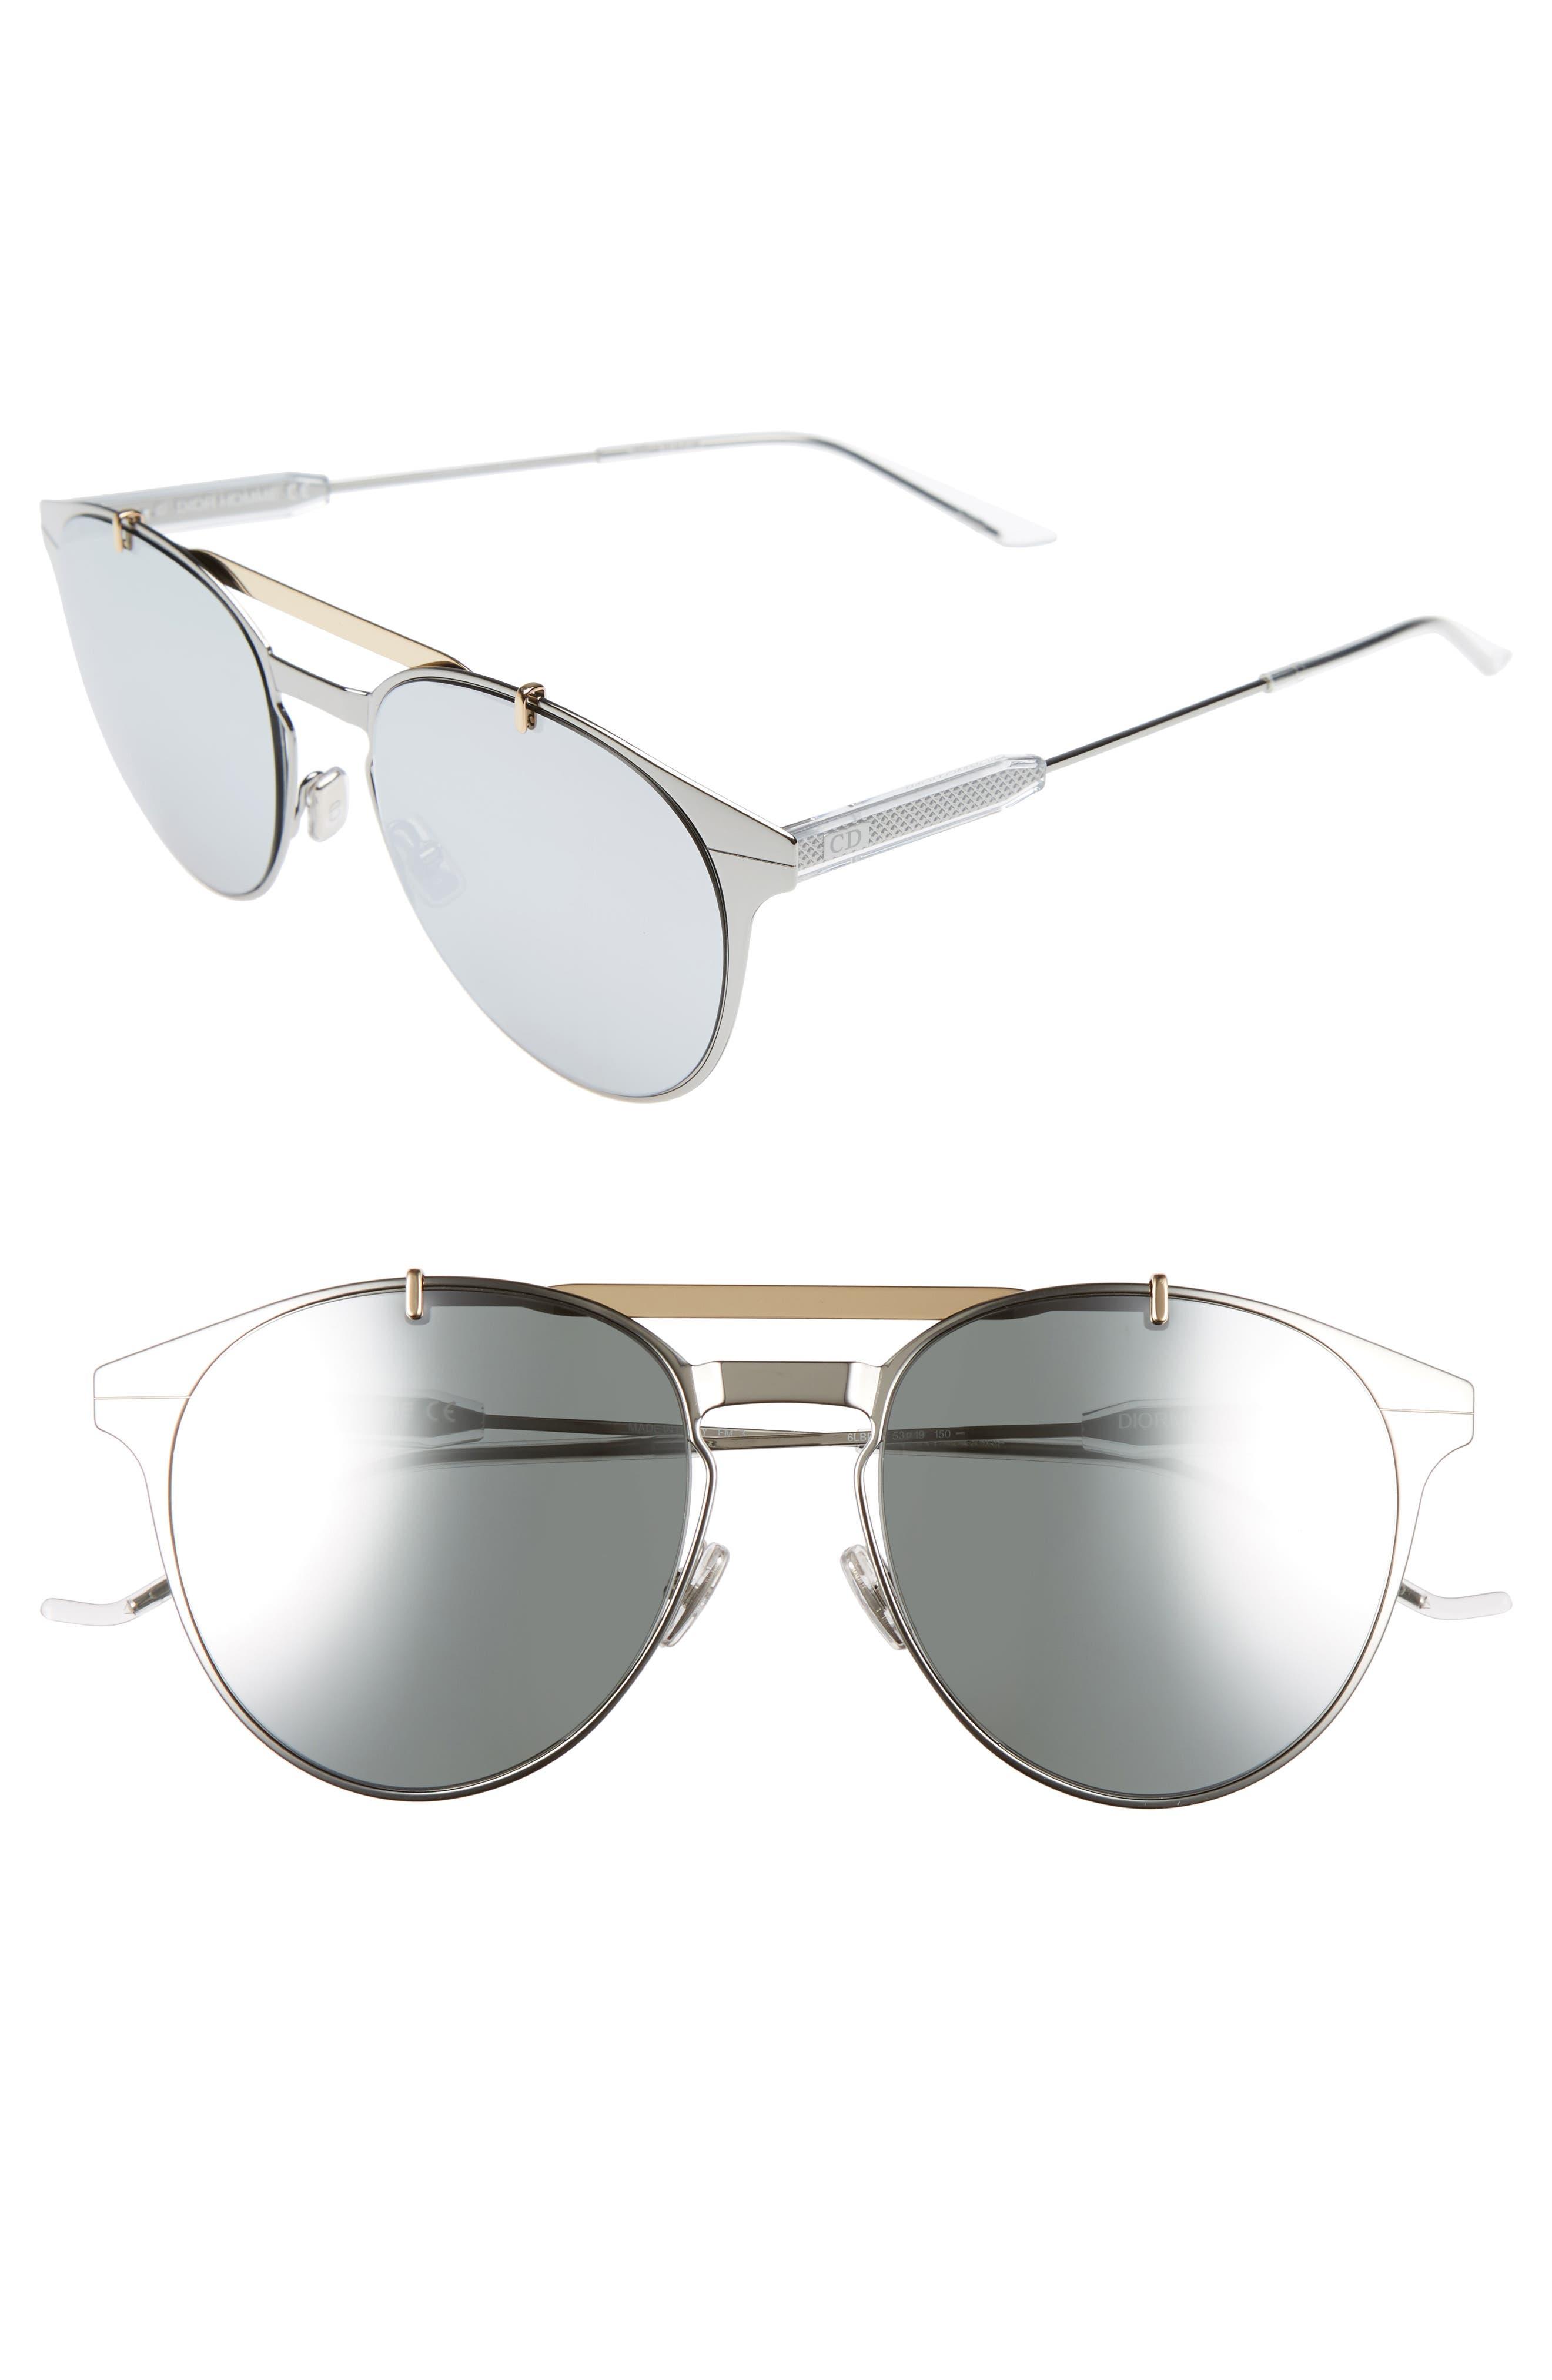 Motion 53mm Sunglasses,                         Main,                         color, GREY